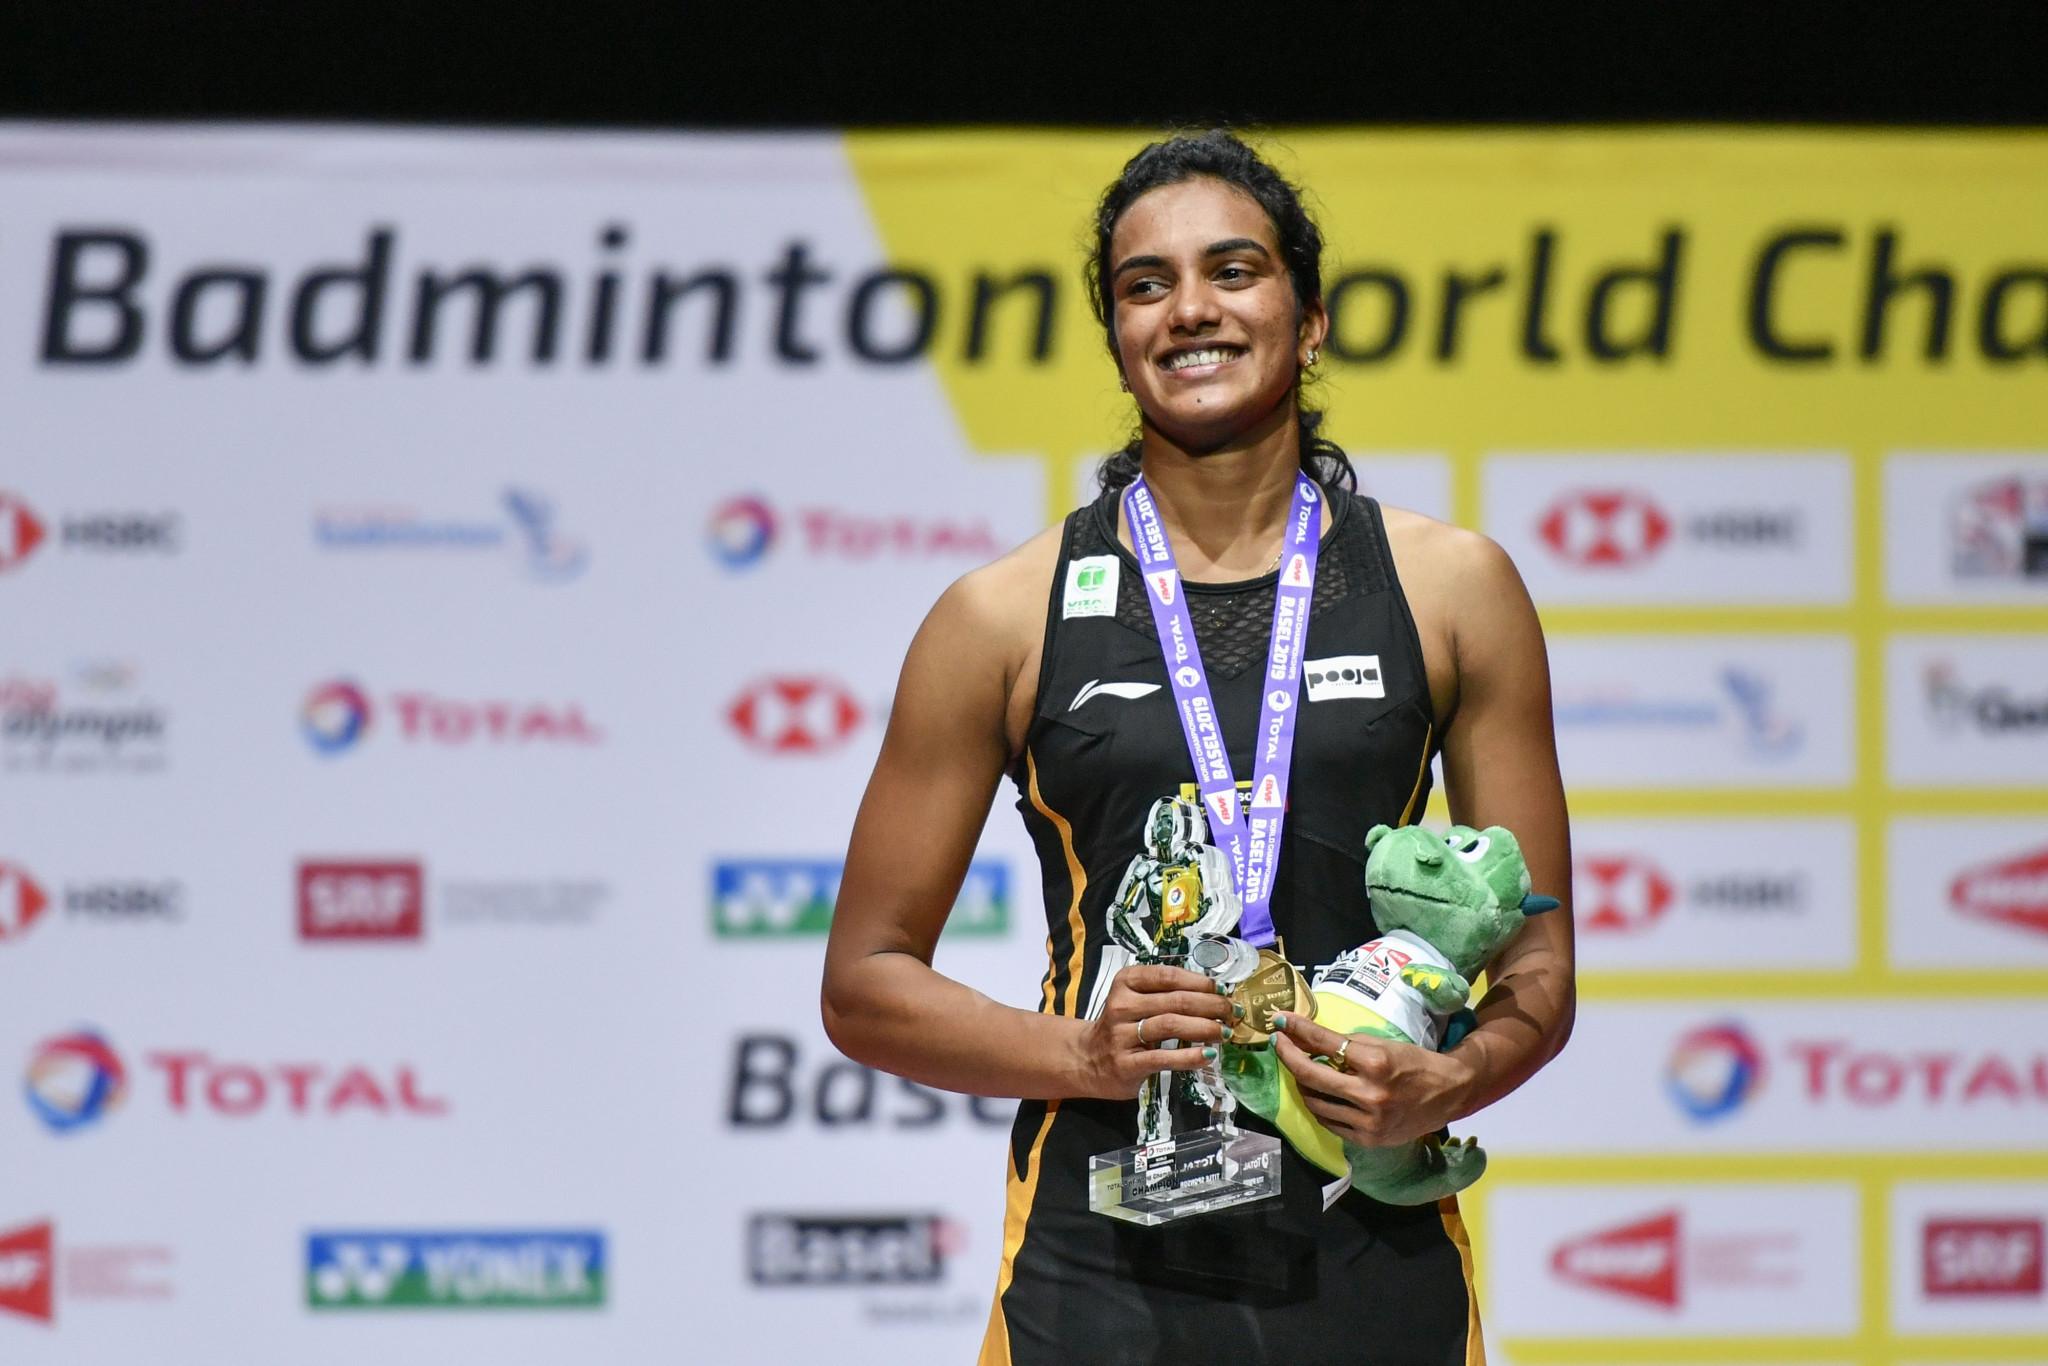 Sindhu ends title wait at BWF World Championships as Momota triumphs again